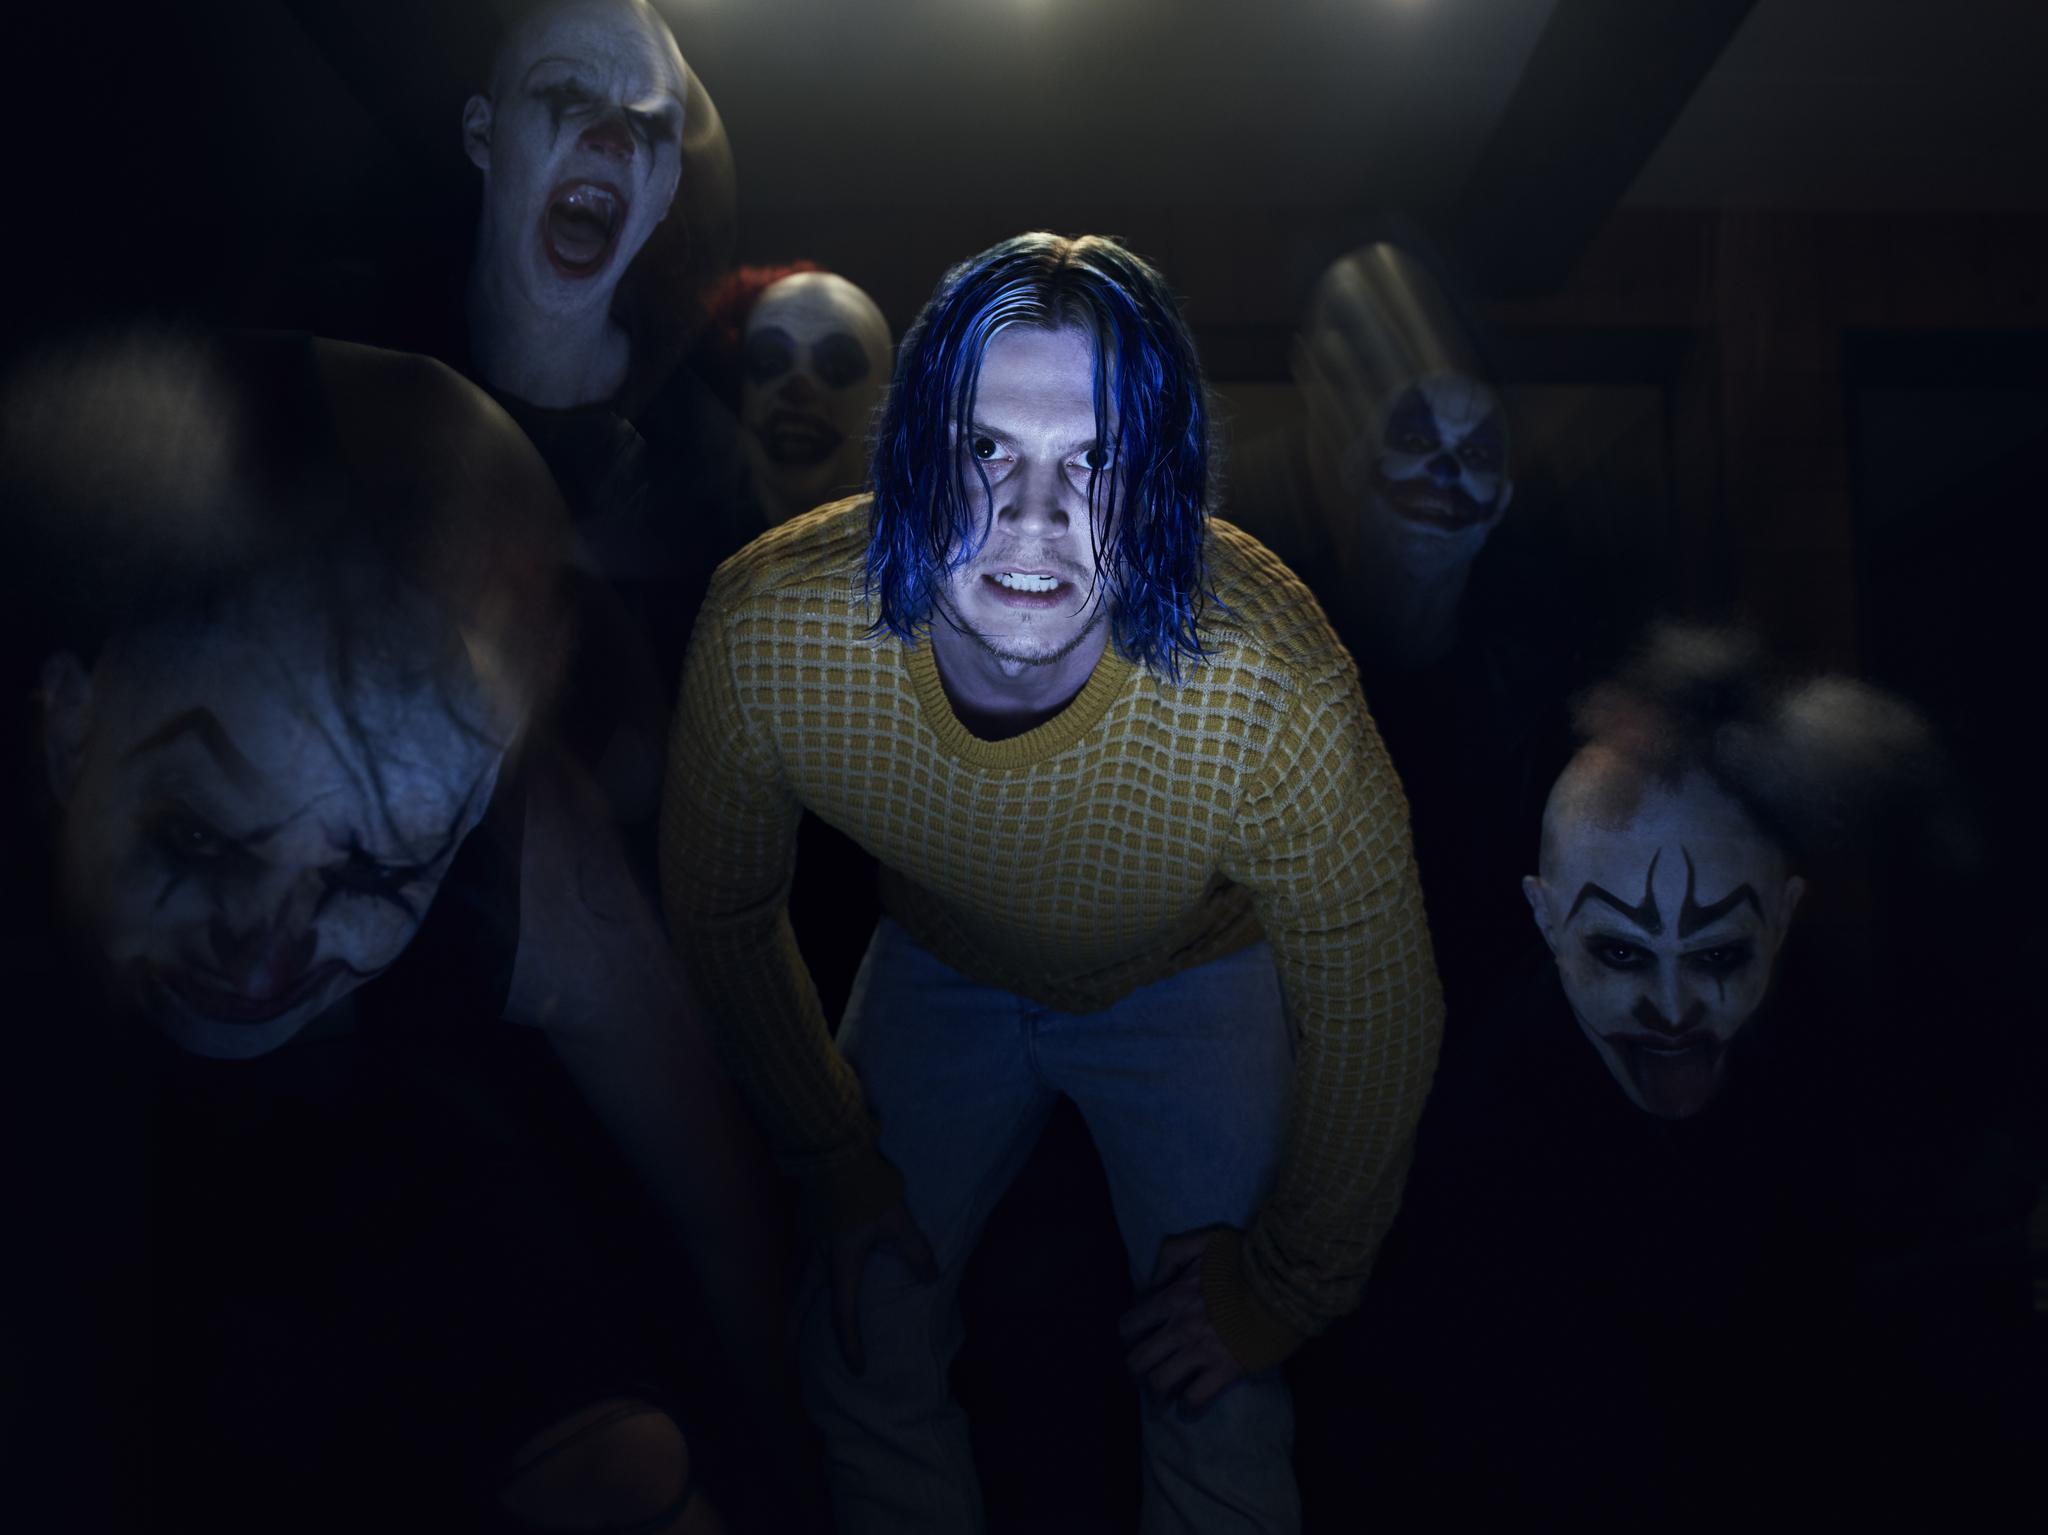 american horror story season 7 episode 1 free